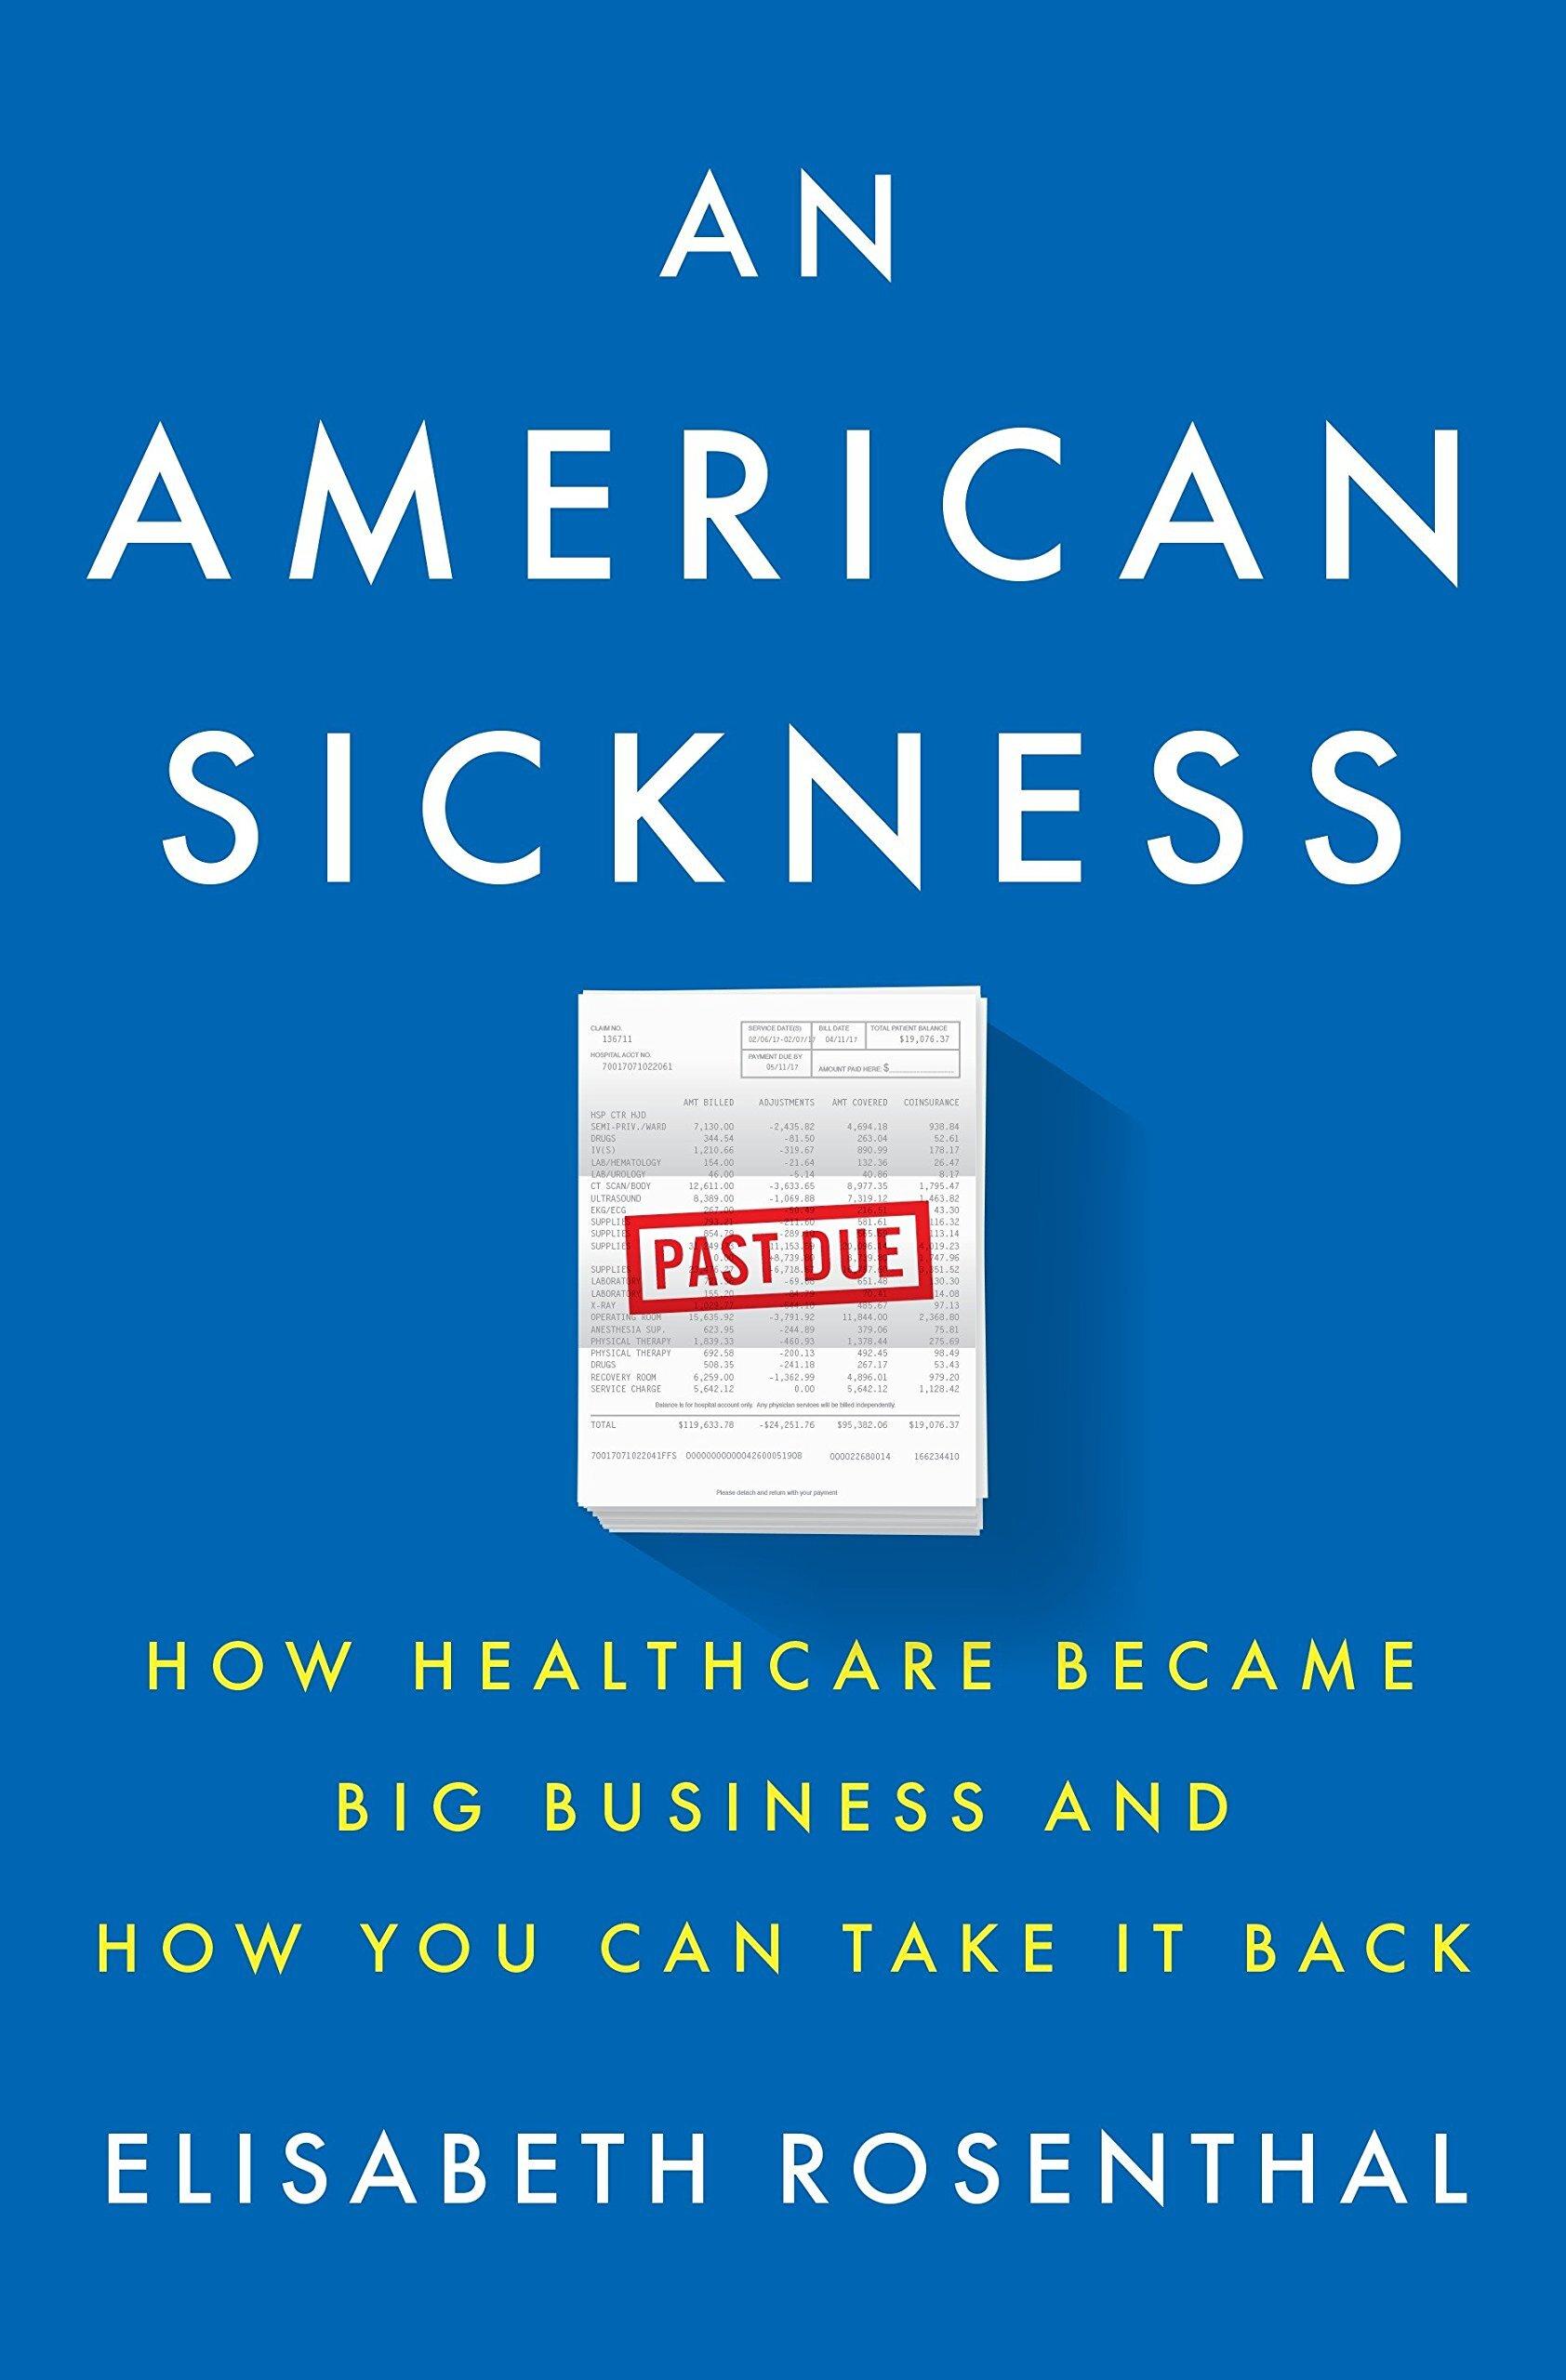 An American Sickness.jpg